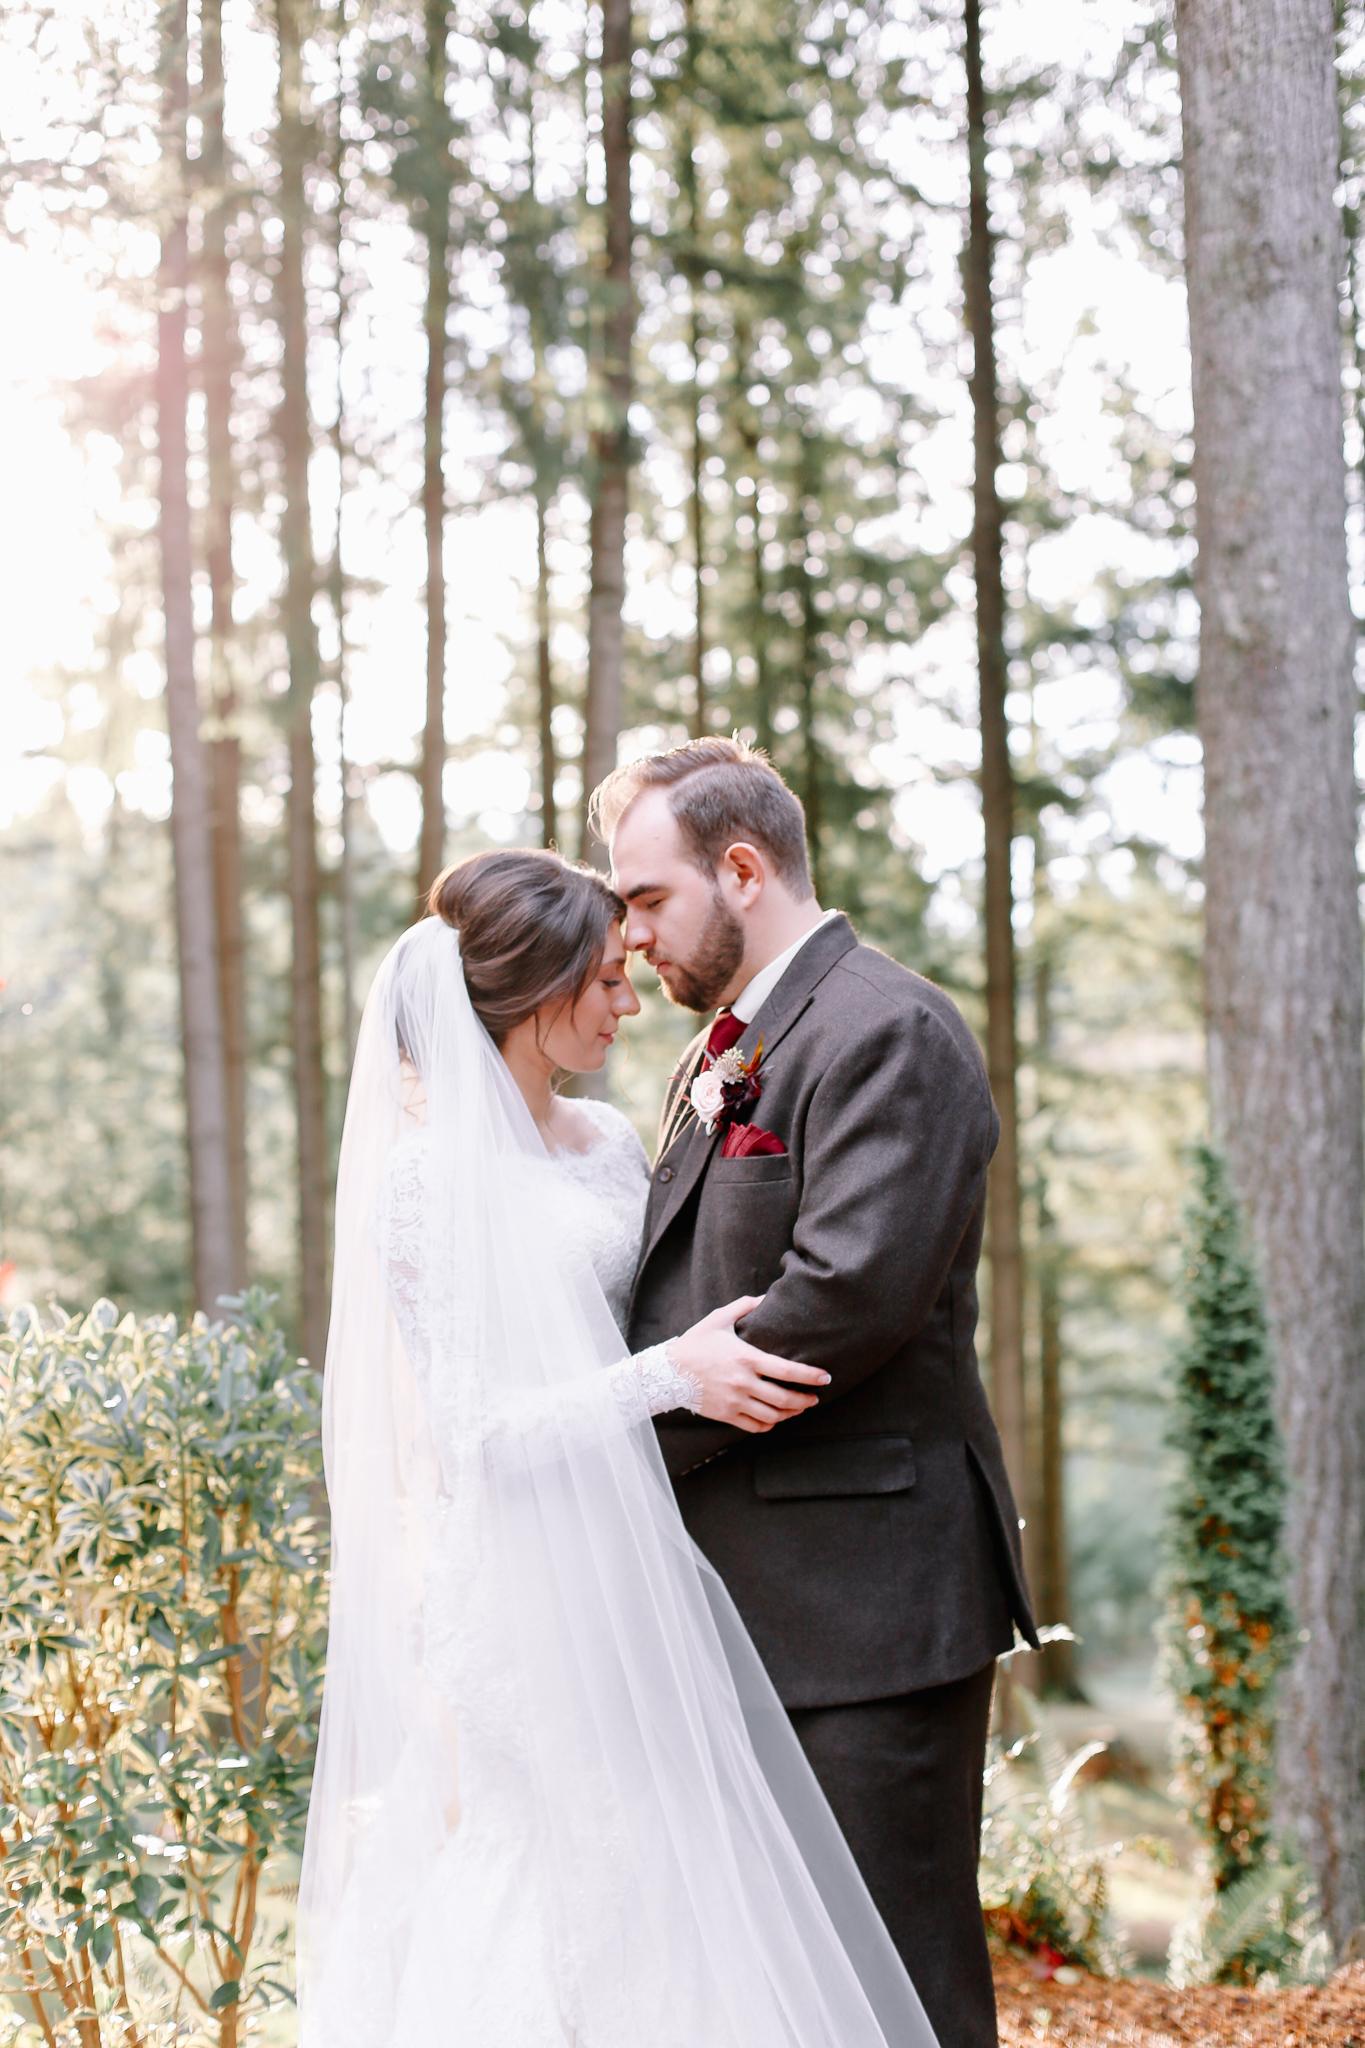 Manu and Laura - Portland Wedding Photographer - 29.jpg